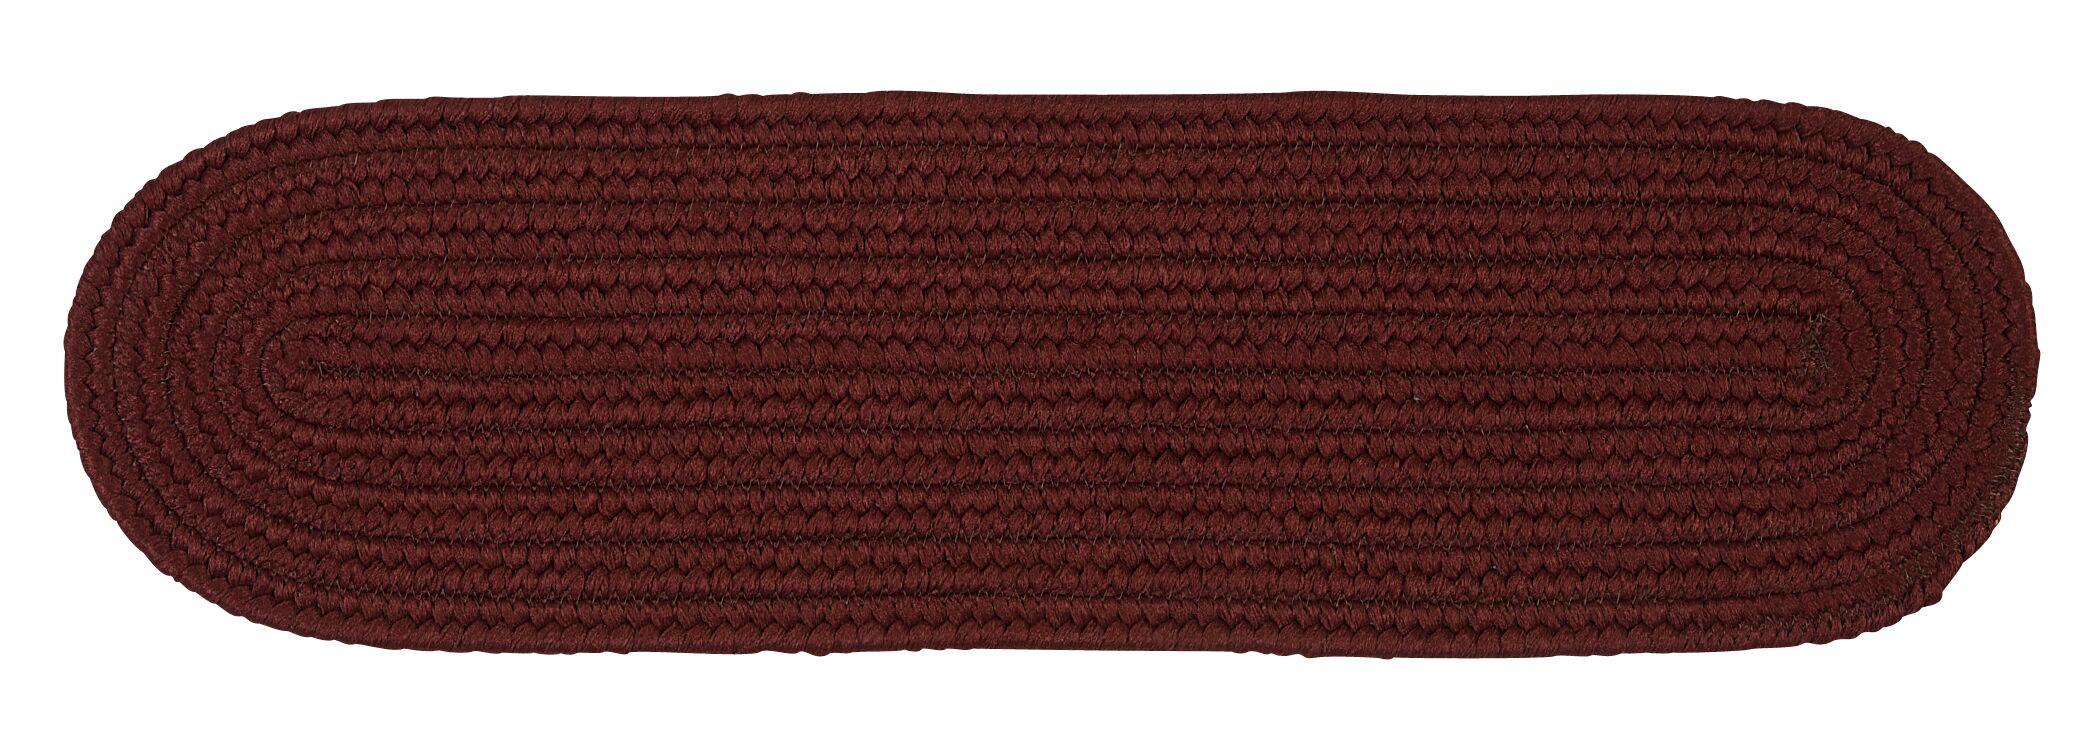 Mcintyre Burgundy Stair Tread Quantity: Set of 13